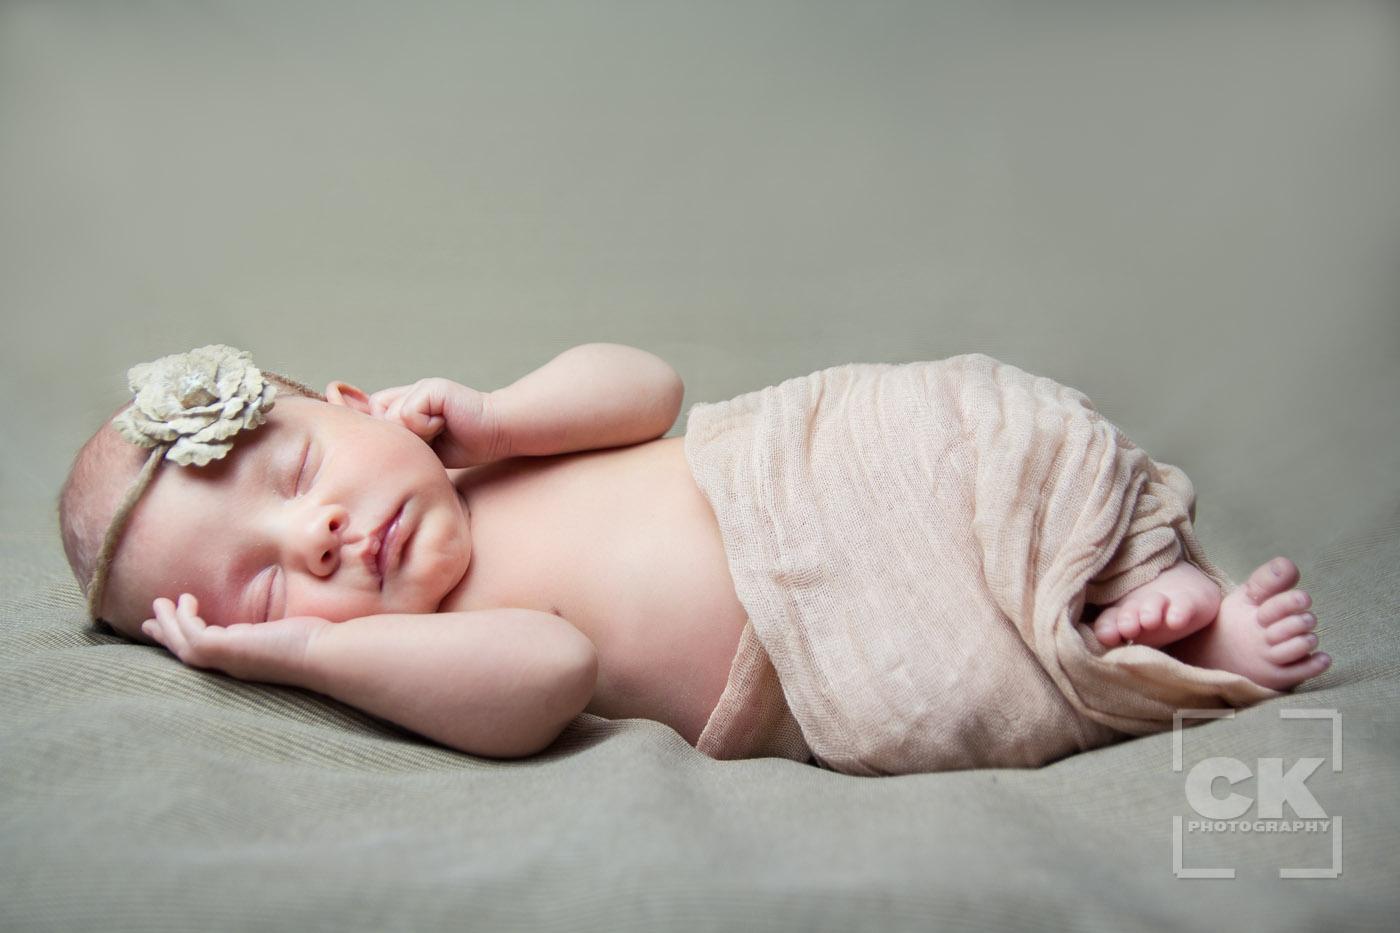 Chris Kryzanek Photography - newborn wrapped with flower headband